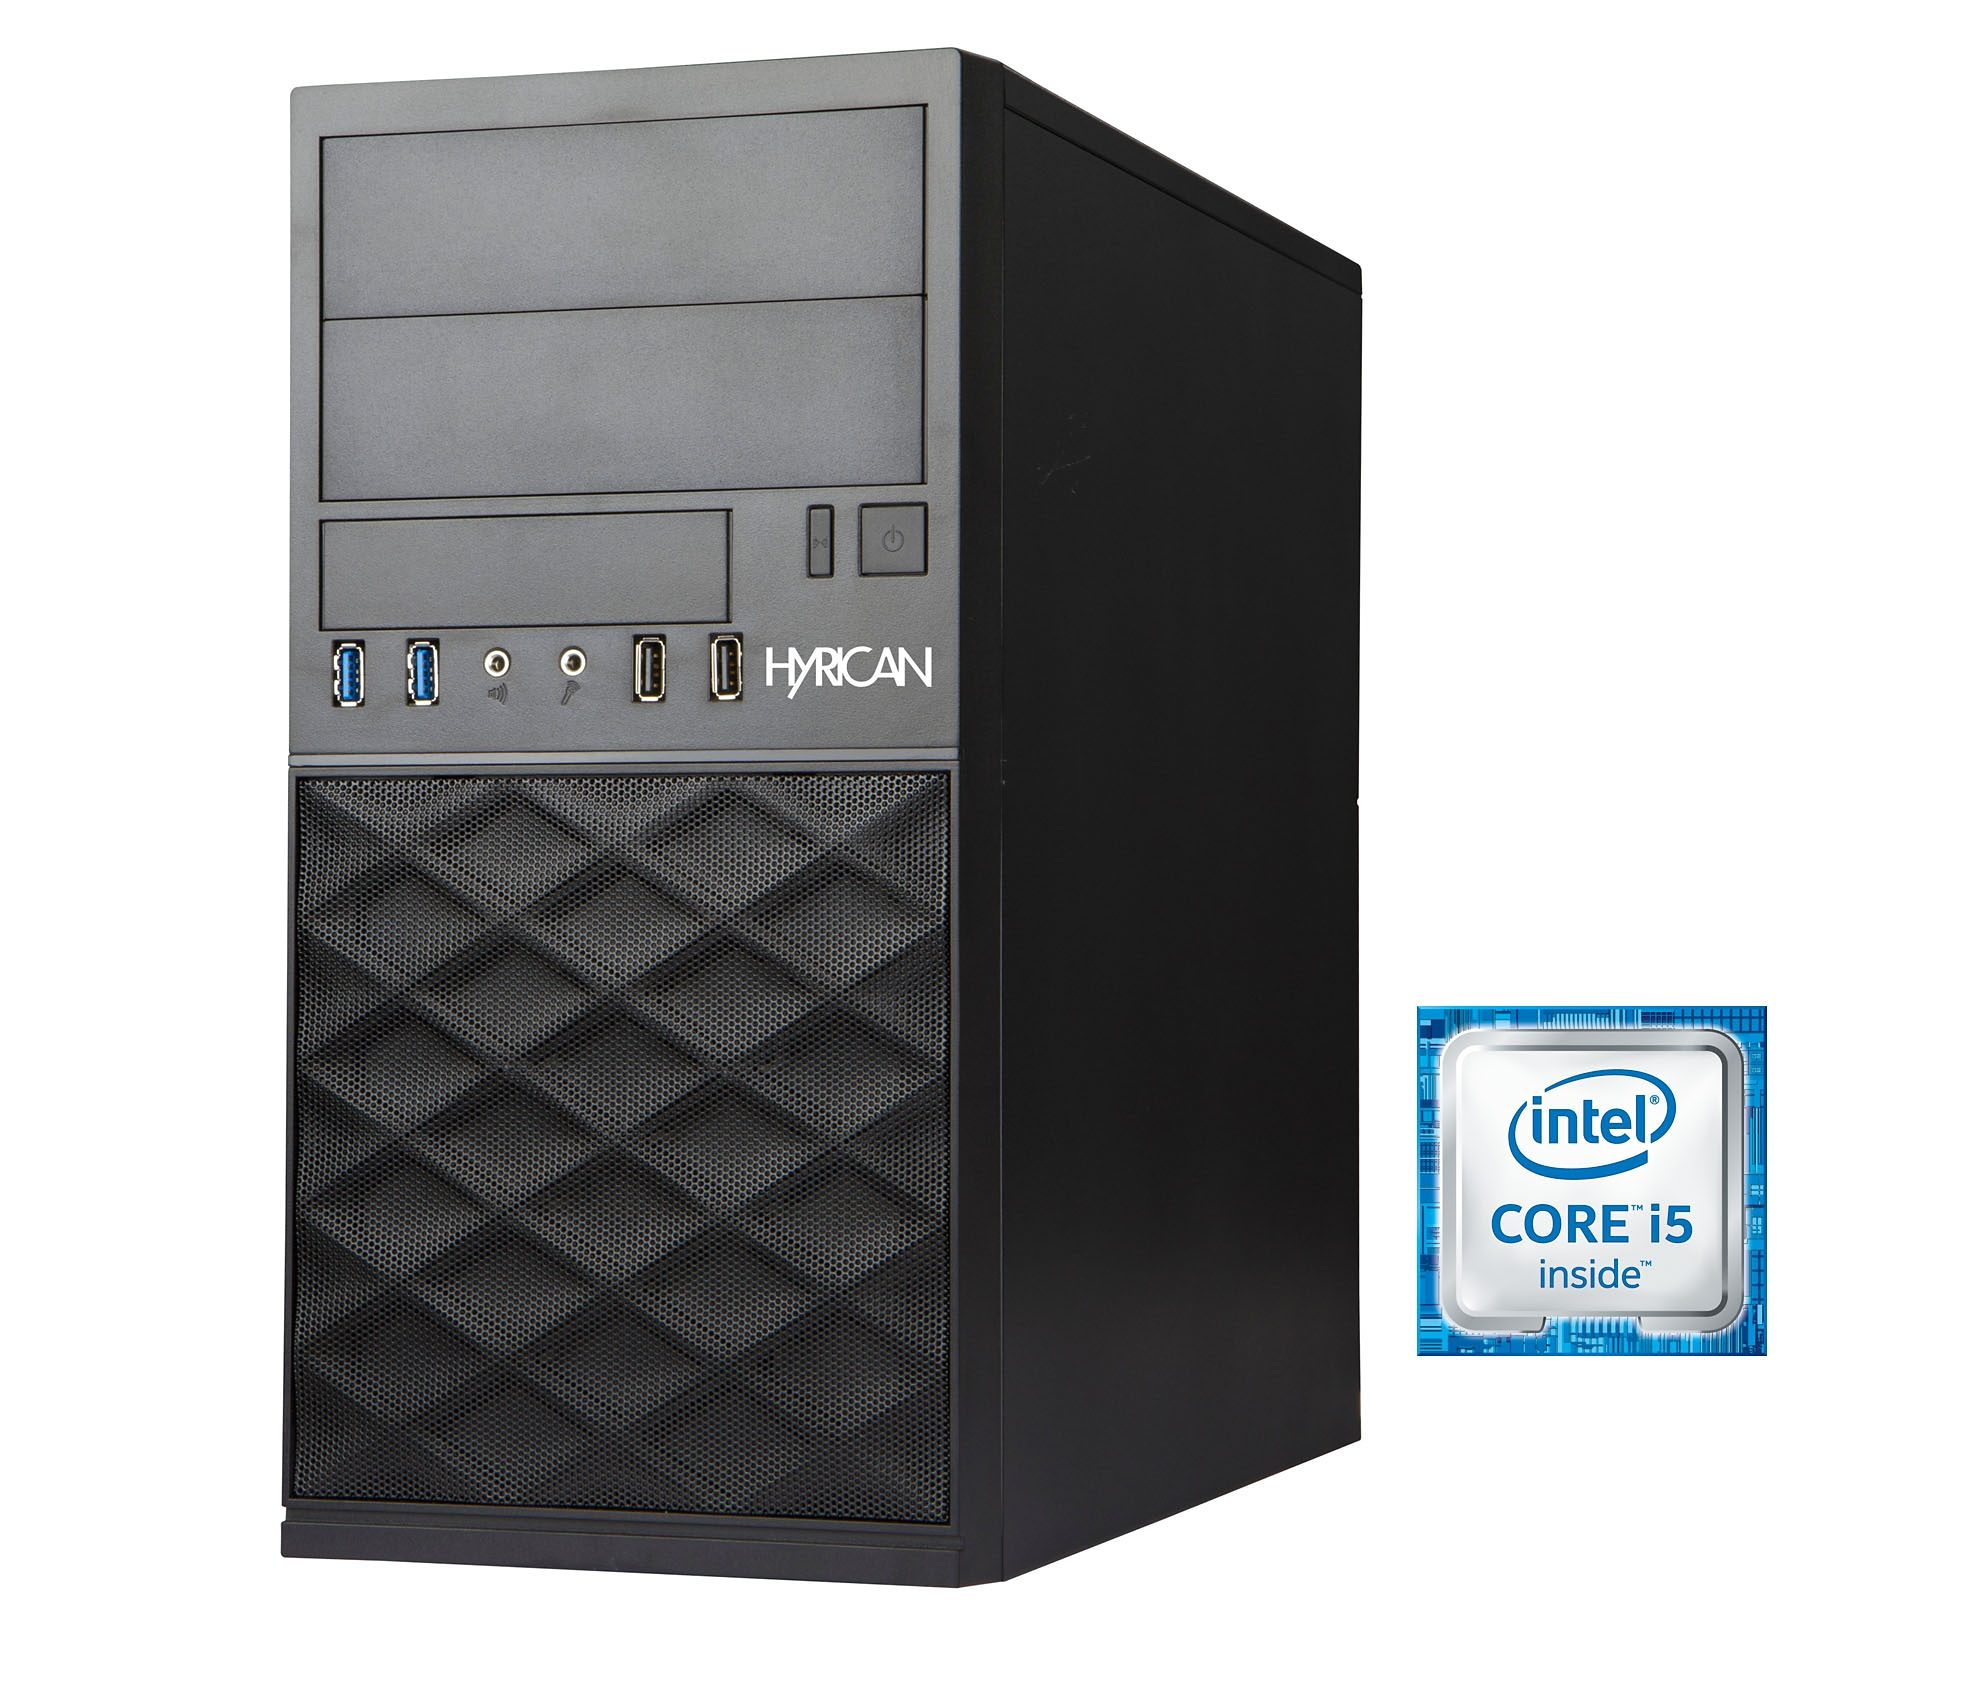 Hyrican Business PC Intel® Core™ i5-6400, 8GB, 240GB, Windows 10 Pro »Gigabyte Edition CTS00301«